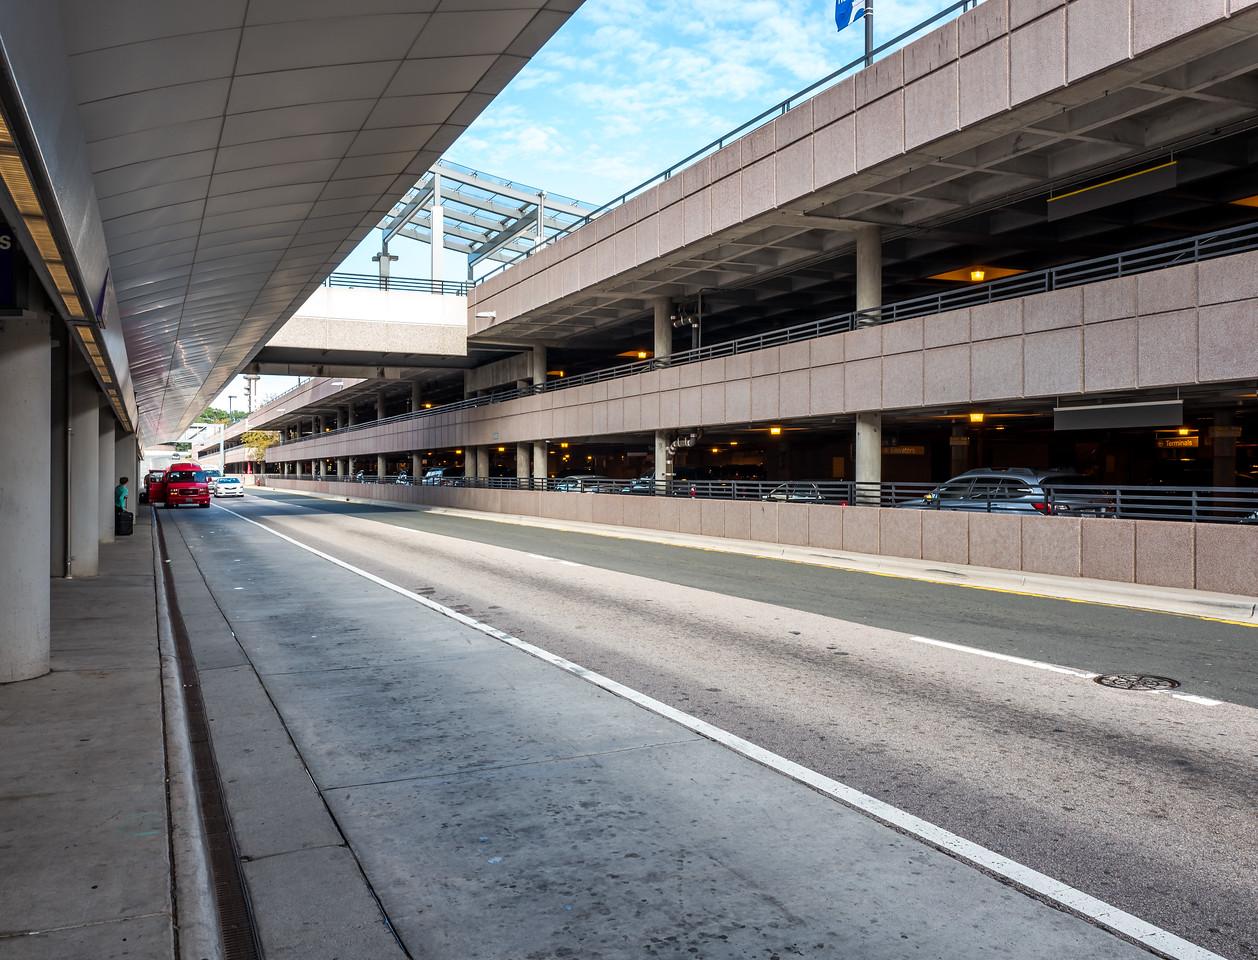 RDU airport, NC